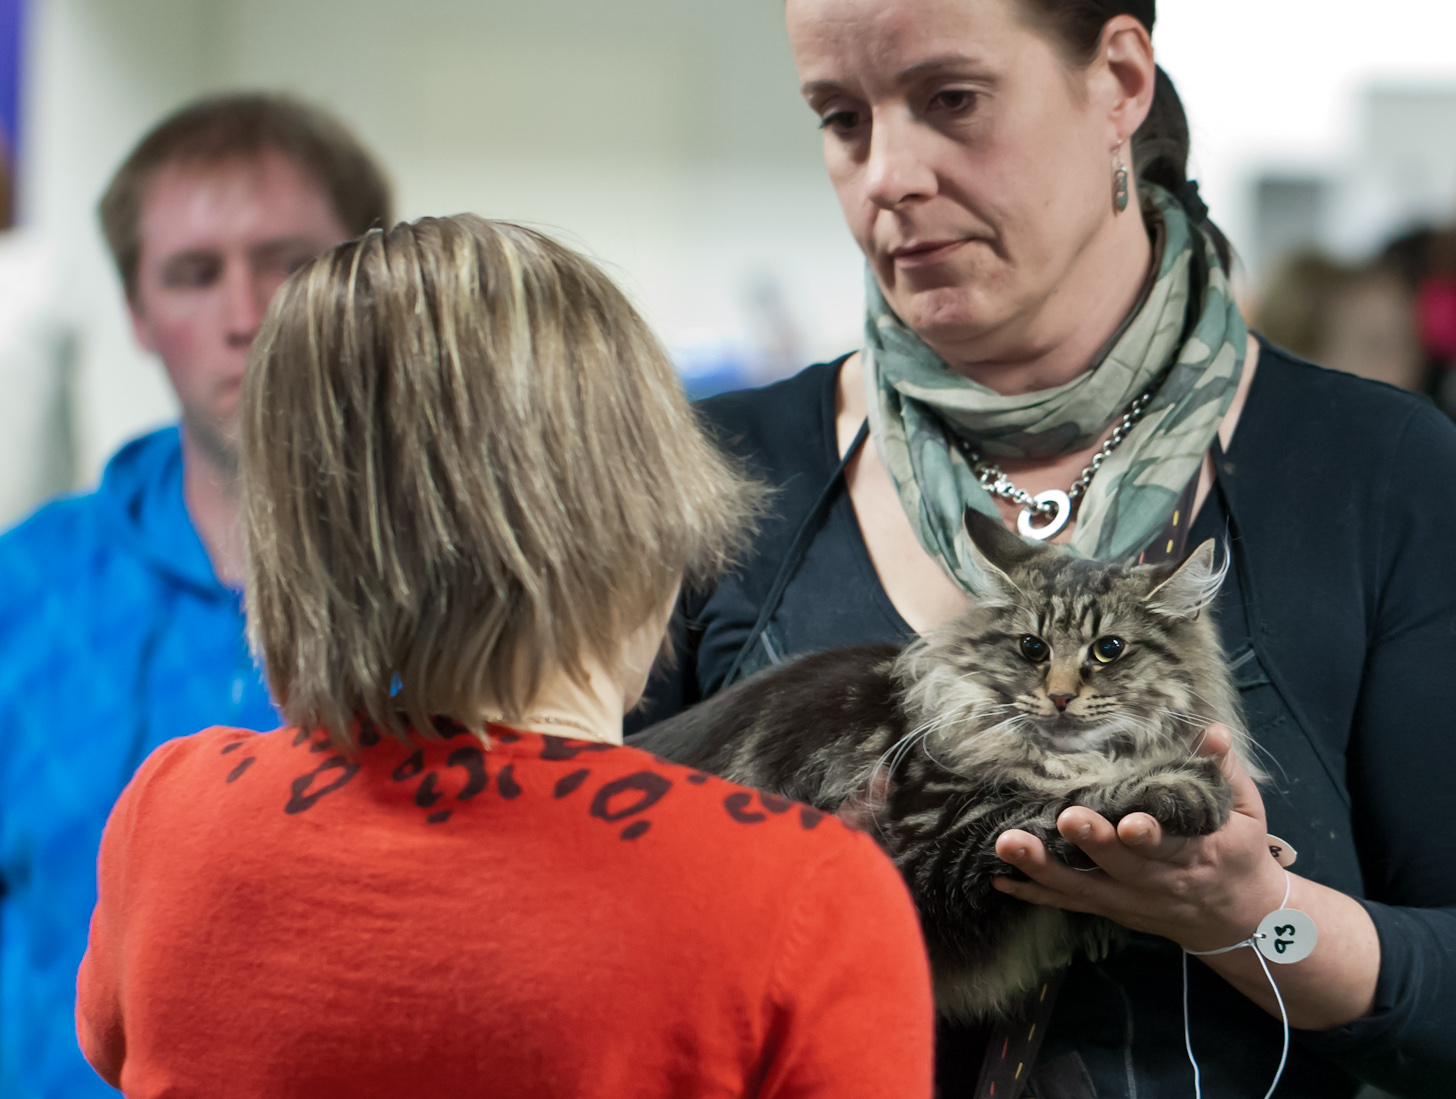 Cat'omatic Hekla [NFO n 22], kuva 193052, 14.4.2012